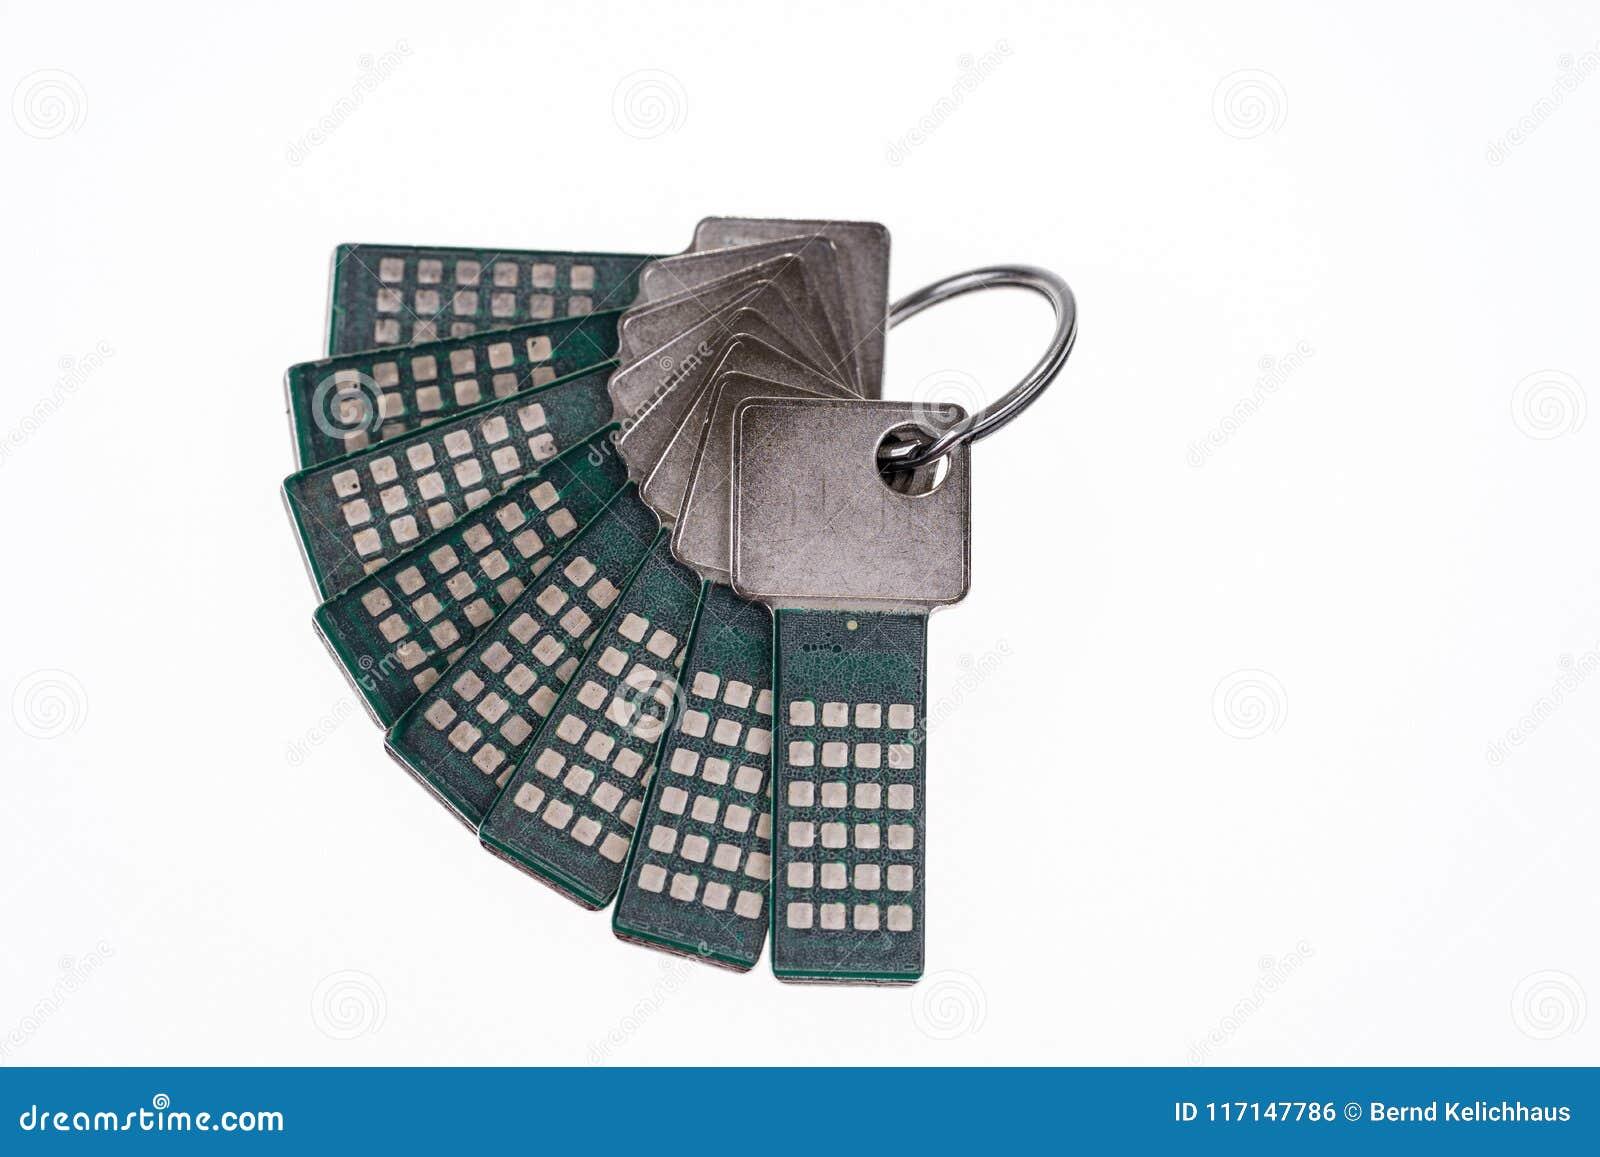 Bundle with security keys